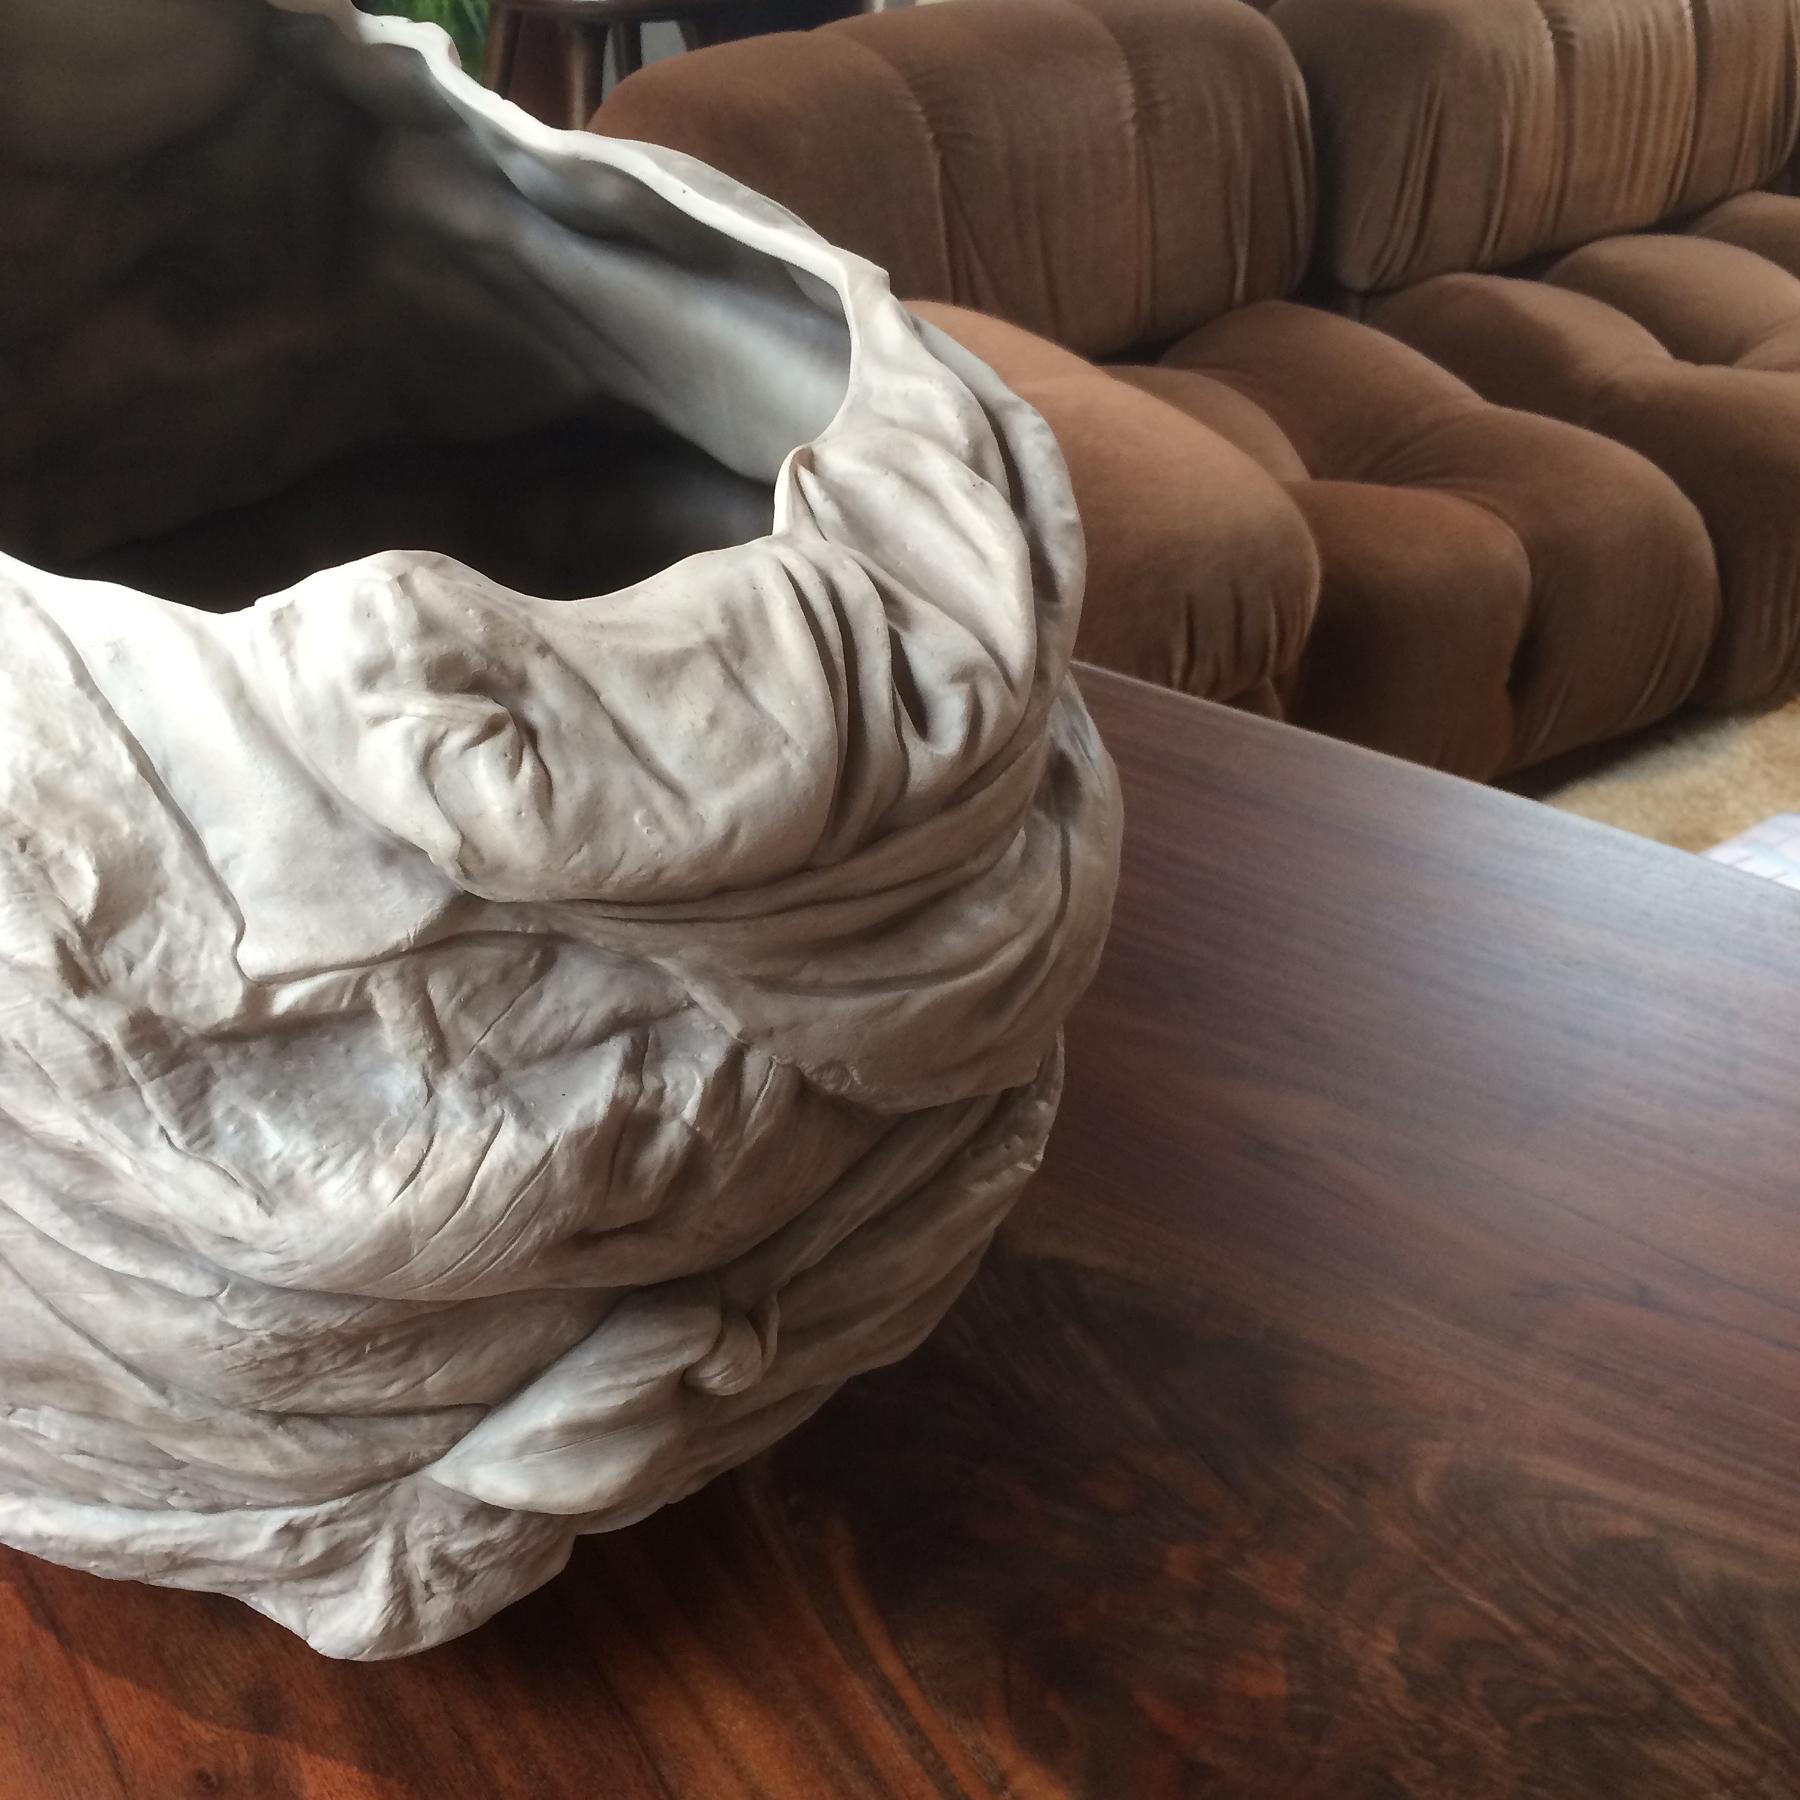 siglo-moderno-brand-history-sculpting-9.jpg